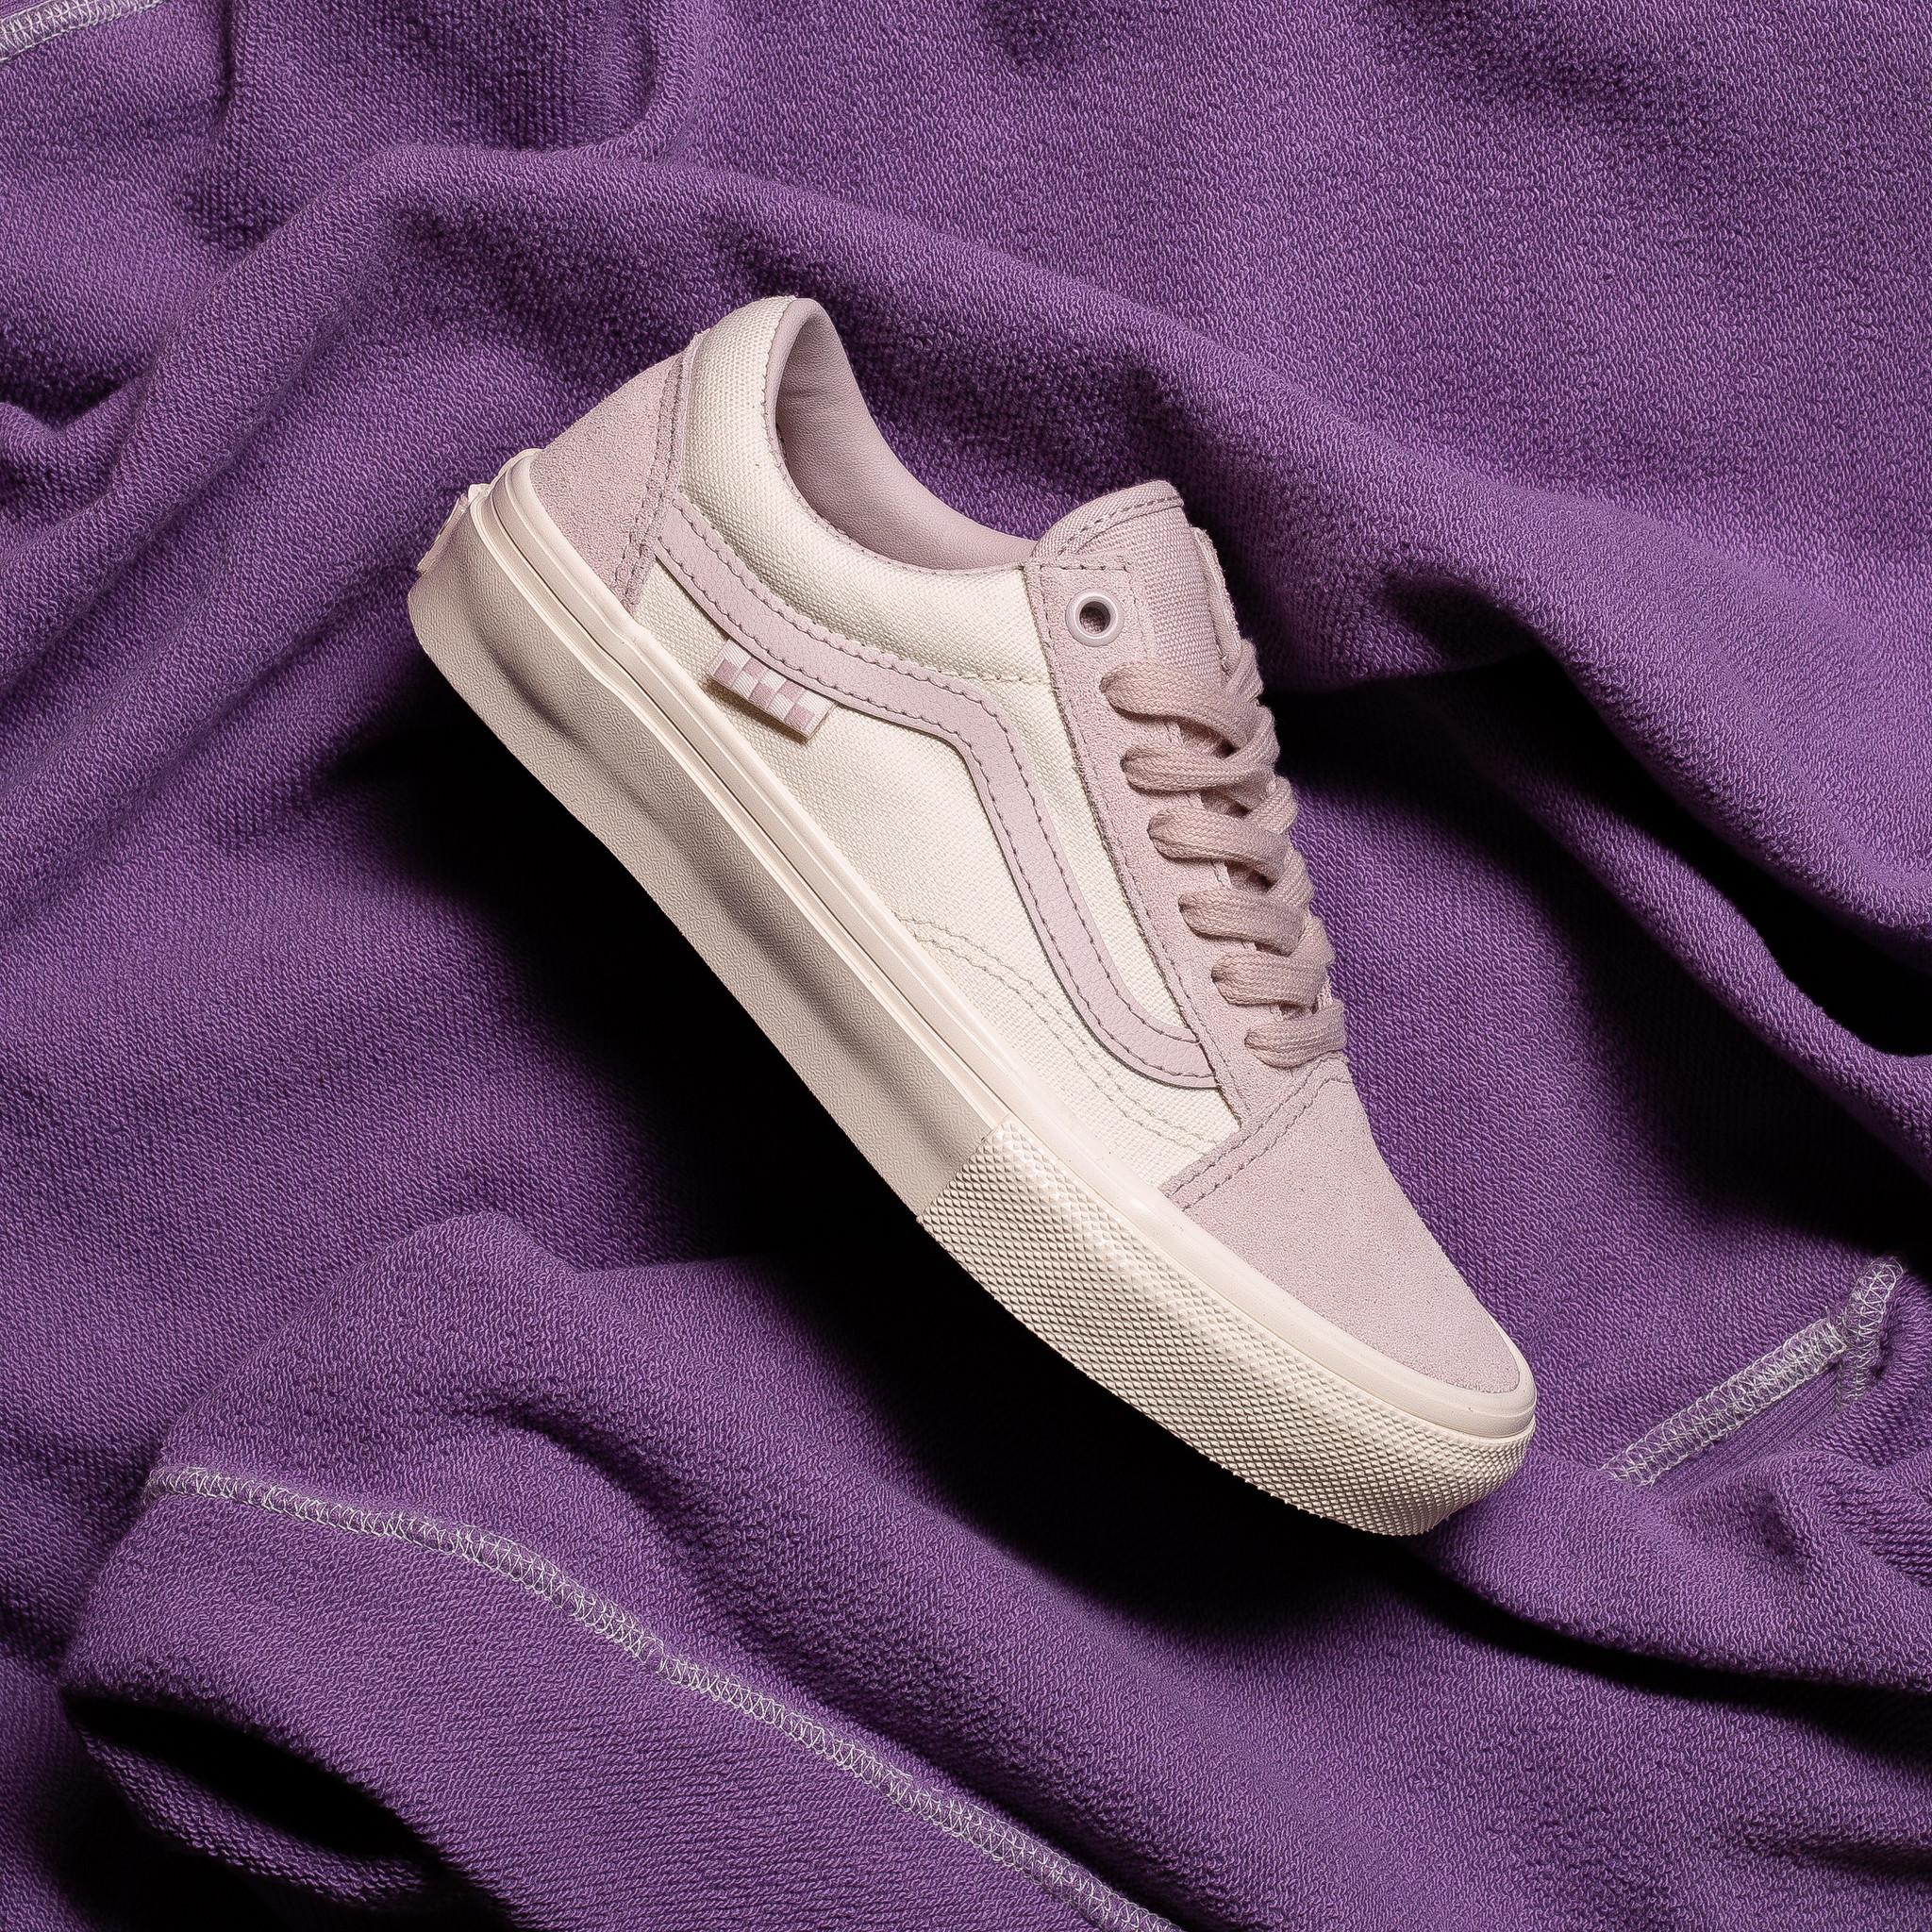 Vans Skate Old Skool Violet/Marshmallow